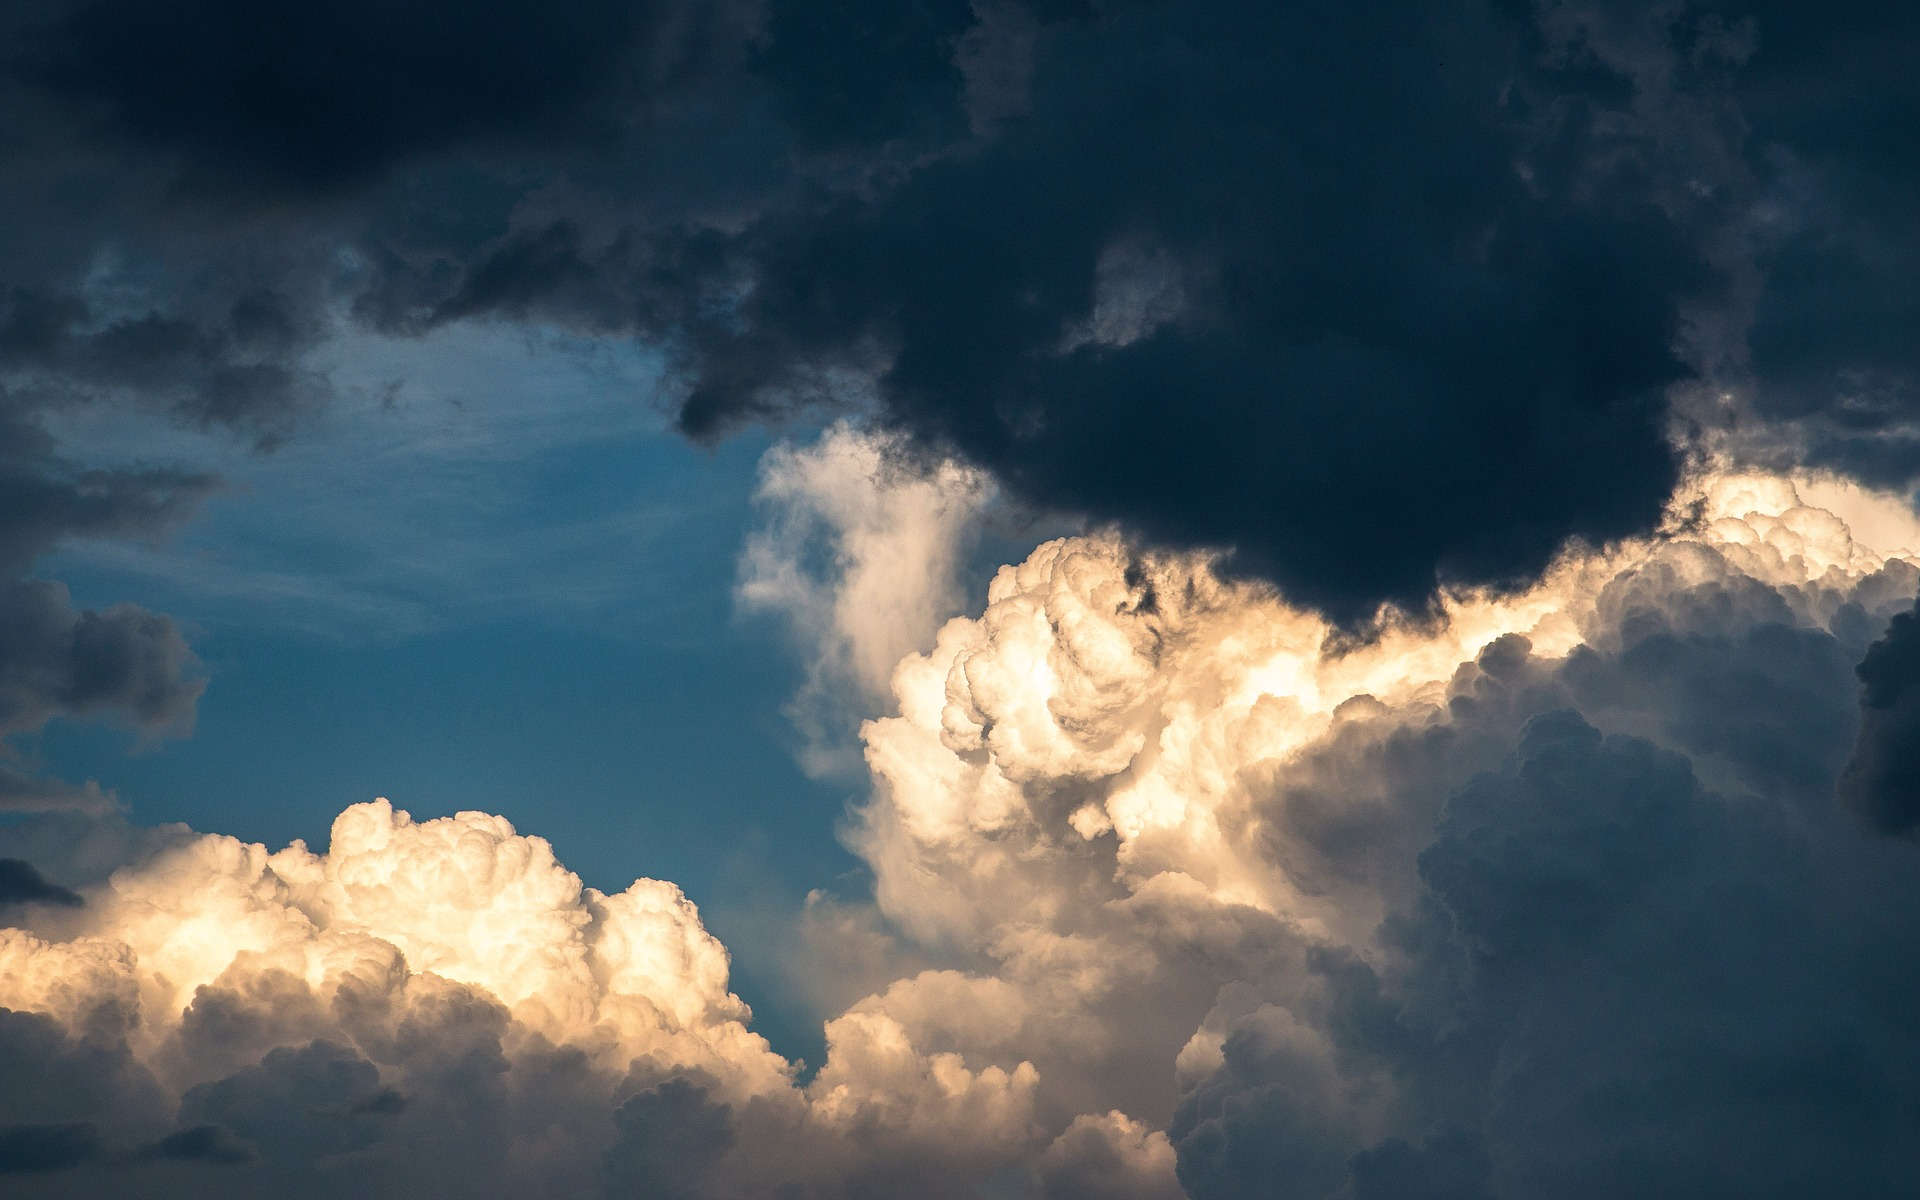 clouds-1768967_1920.jpg